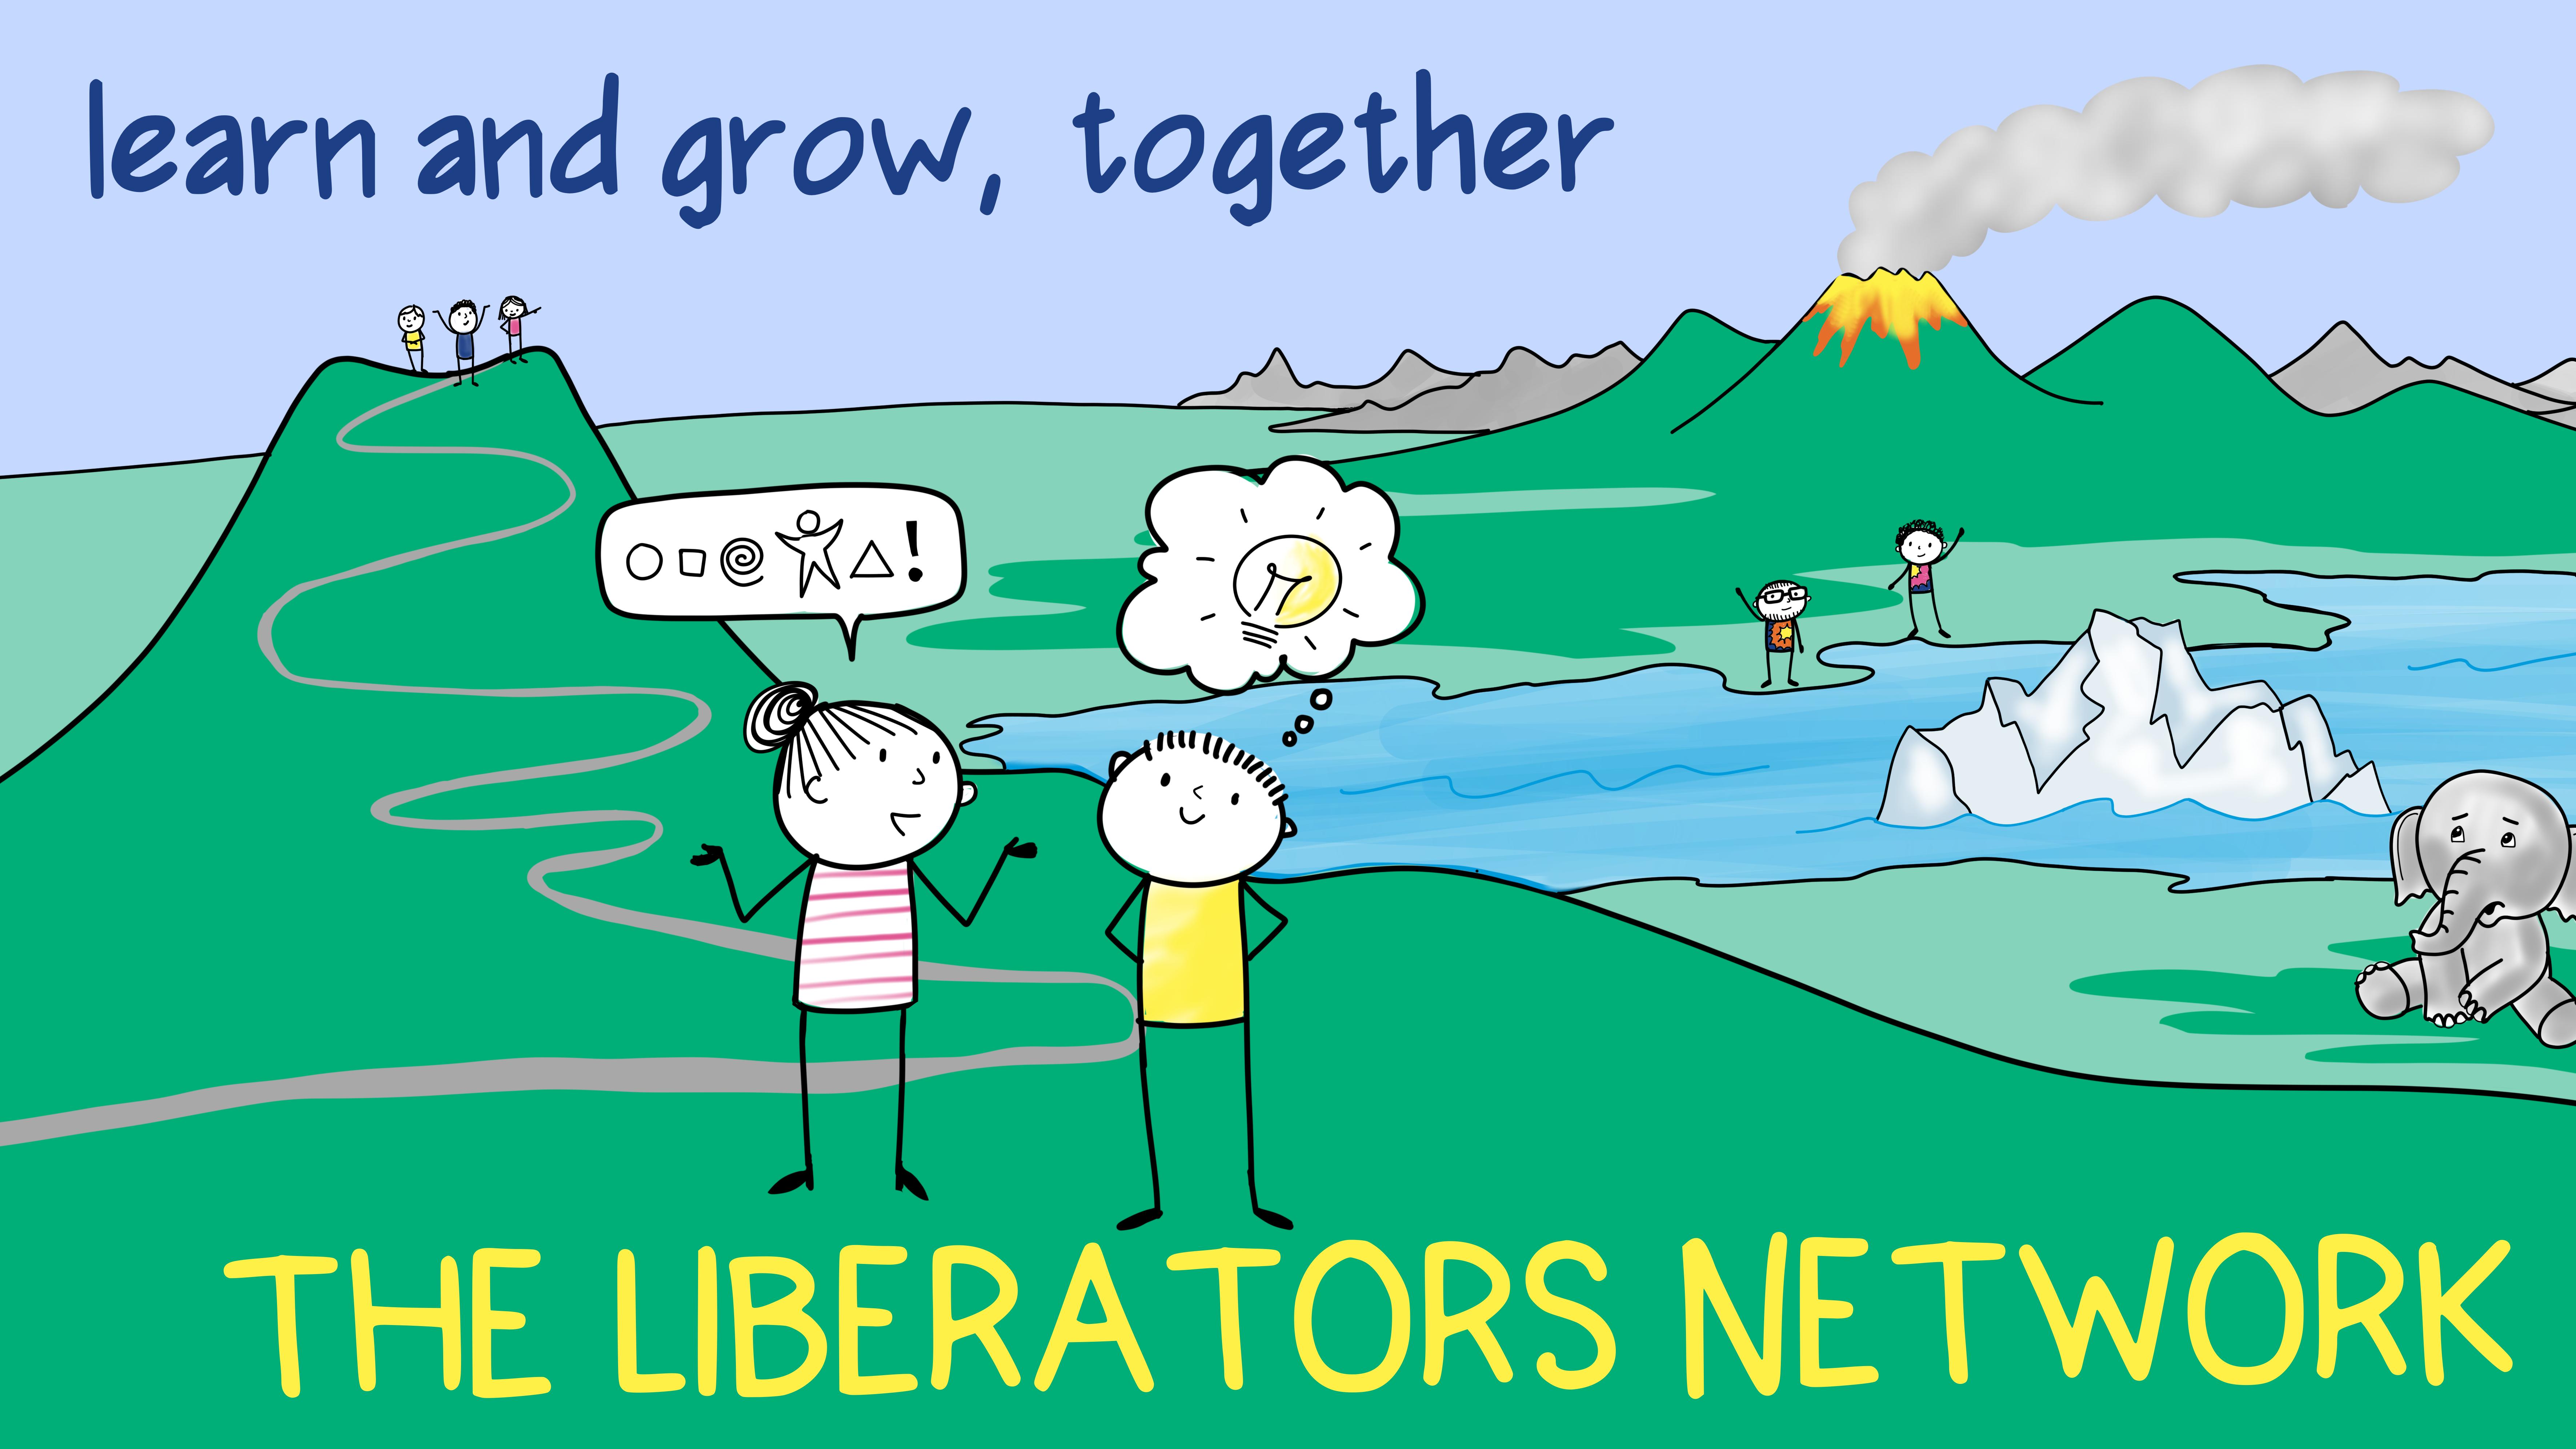 The Liberators Network